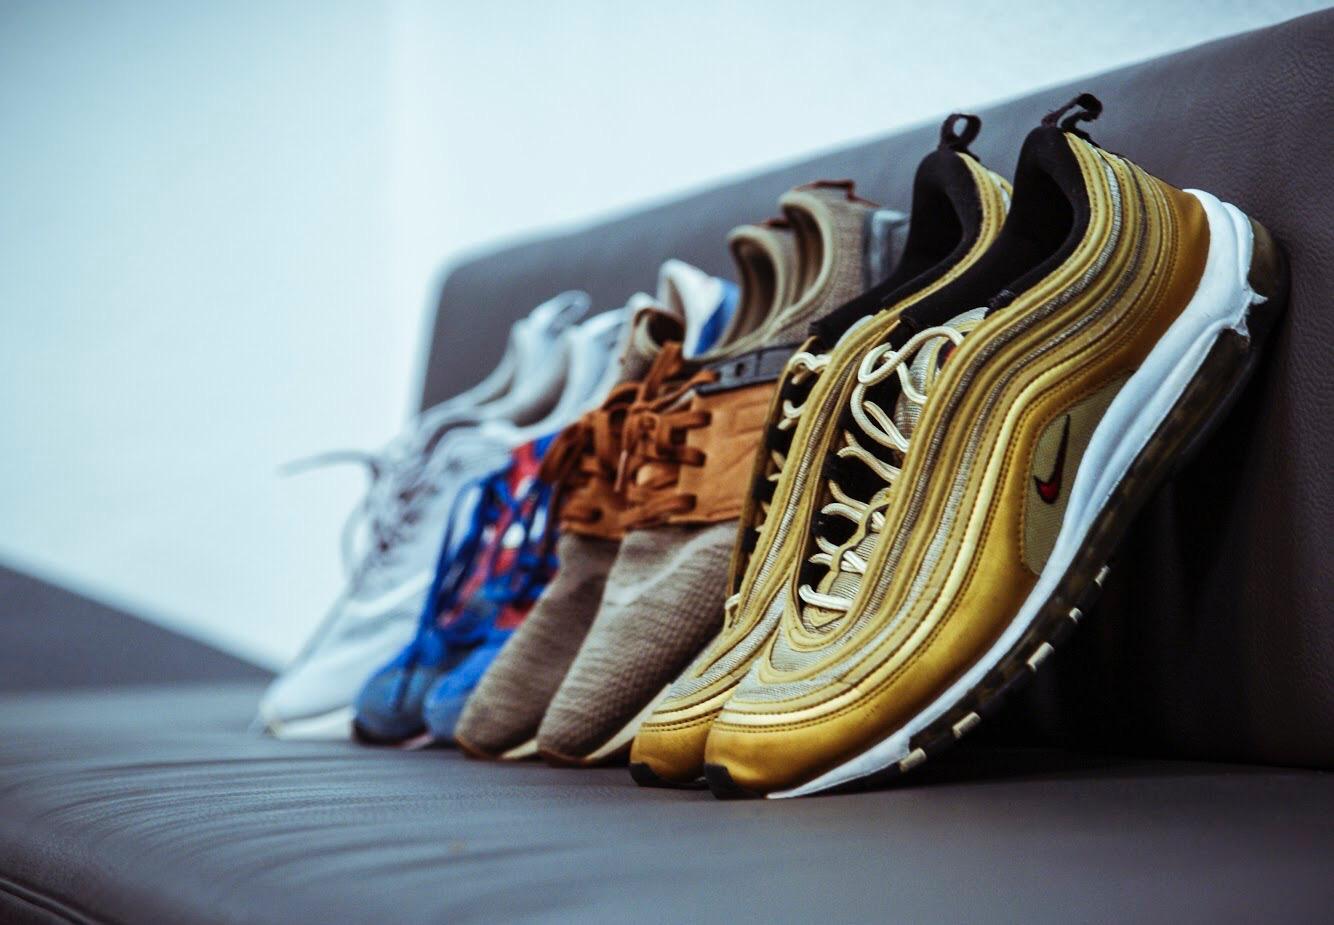 Wozu wegschmeißen, wenn man Sneakers auch reparieren kann? (Foto: Sneaker Rescue)